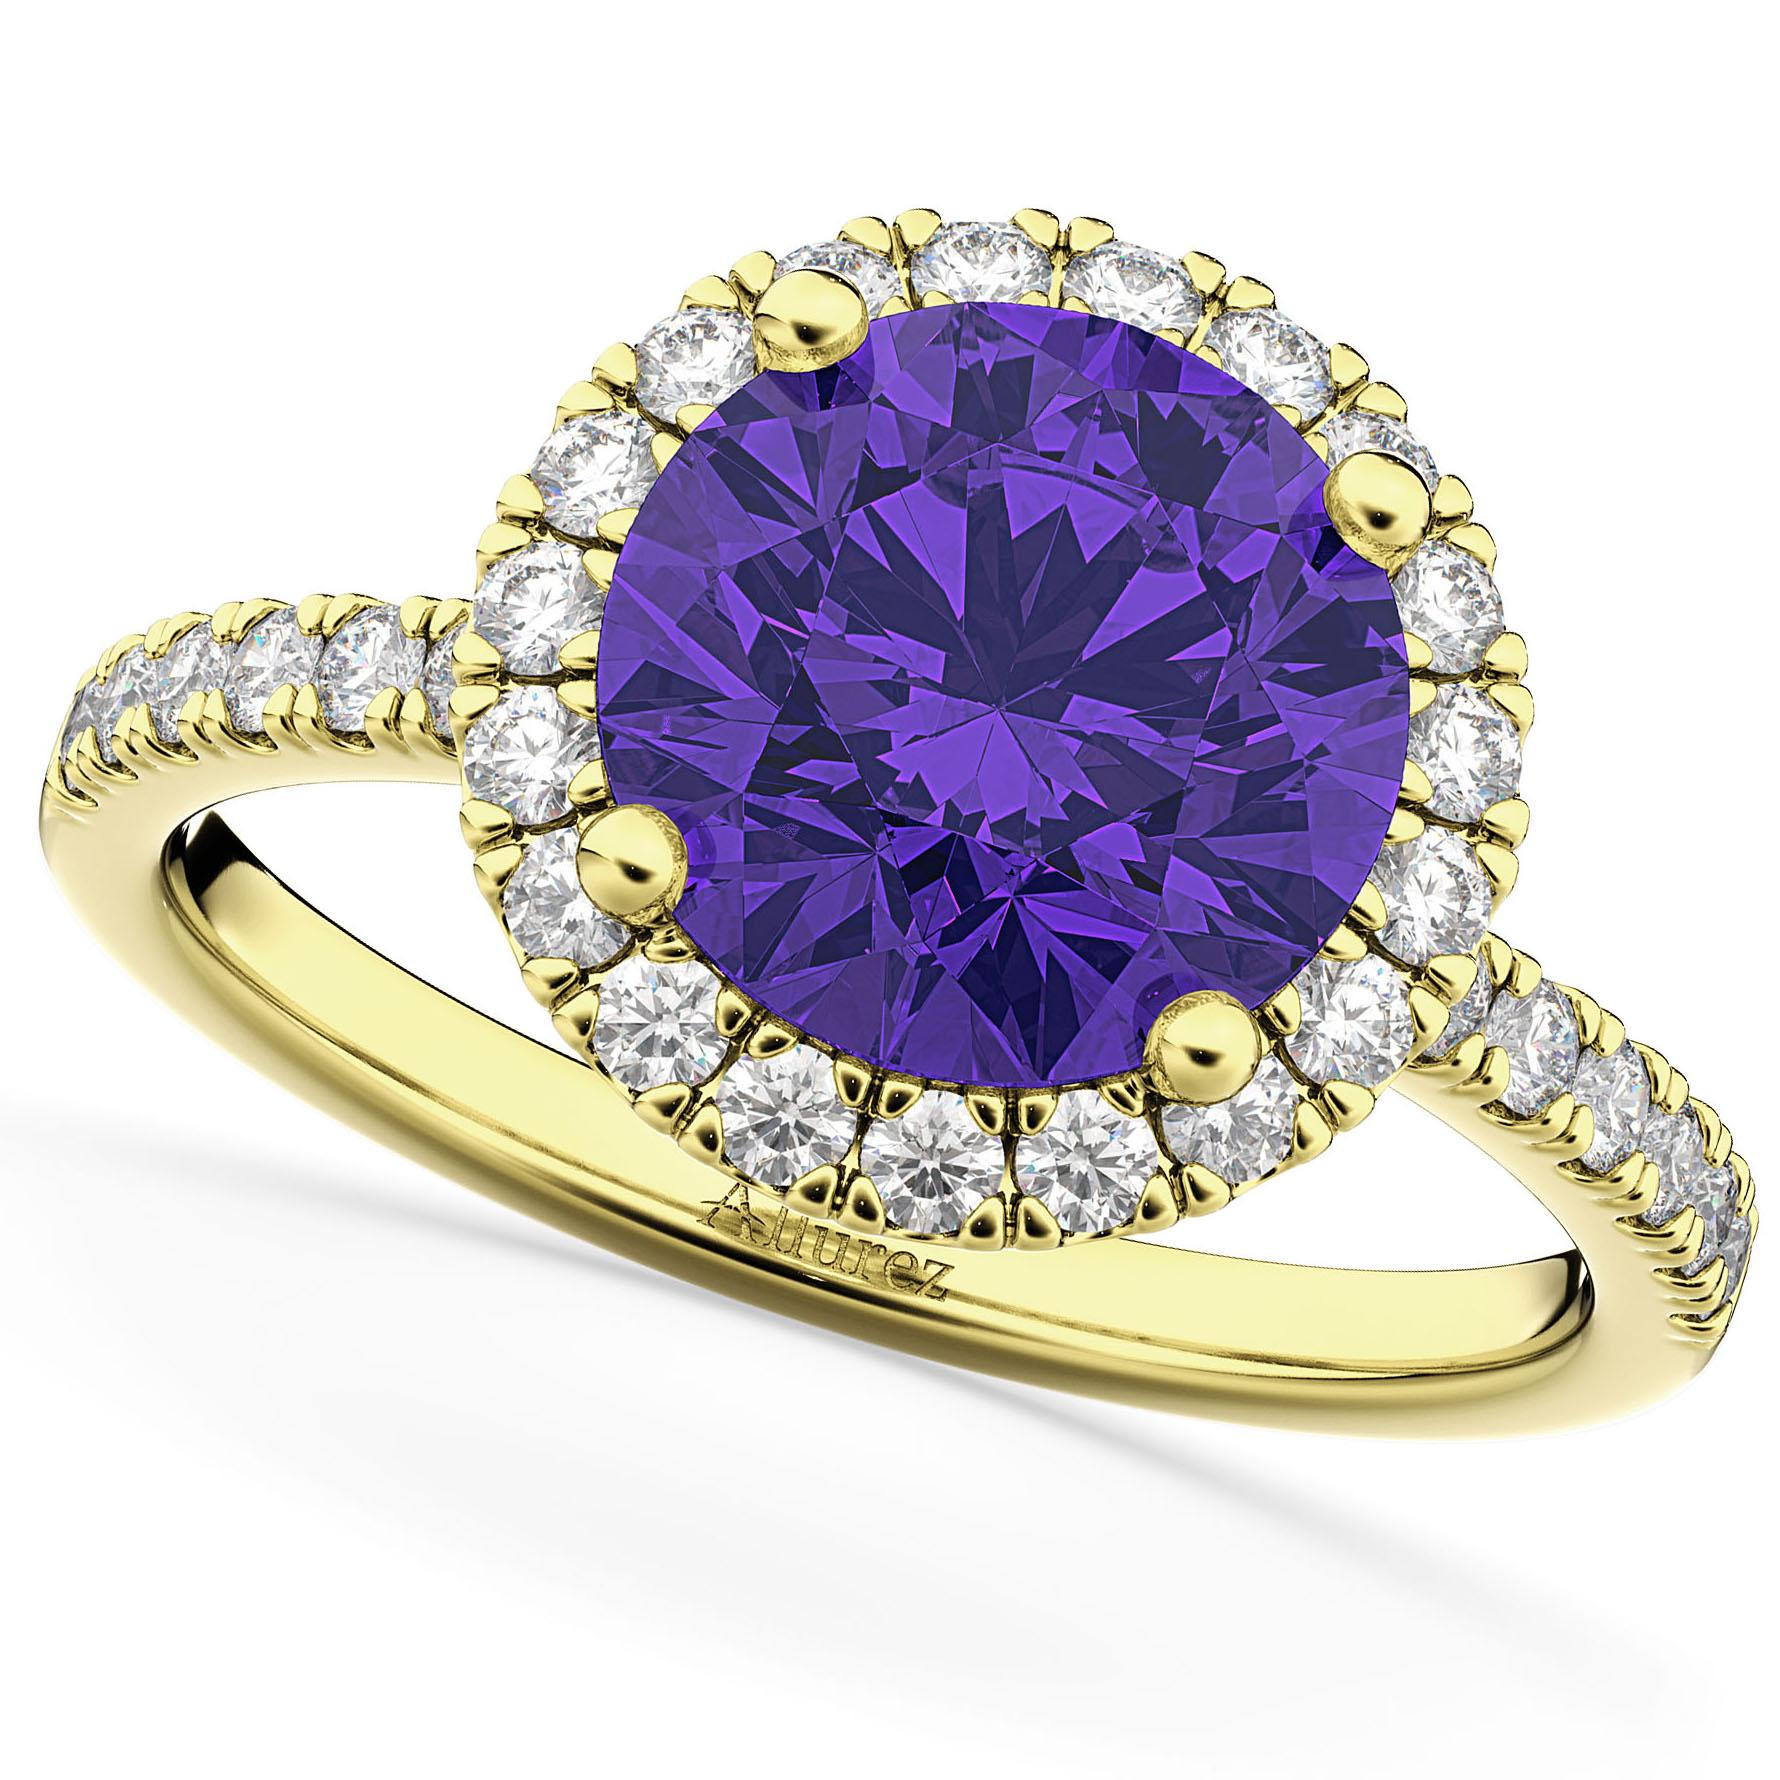 Halo Tanzanite & Diamond Engagement Ring 18K Yellow Gold 2.80ct